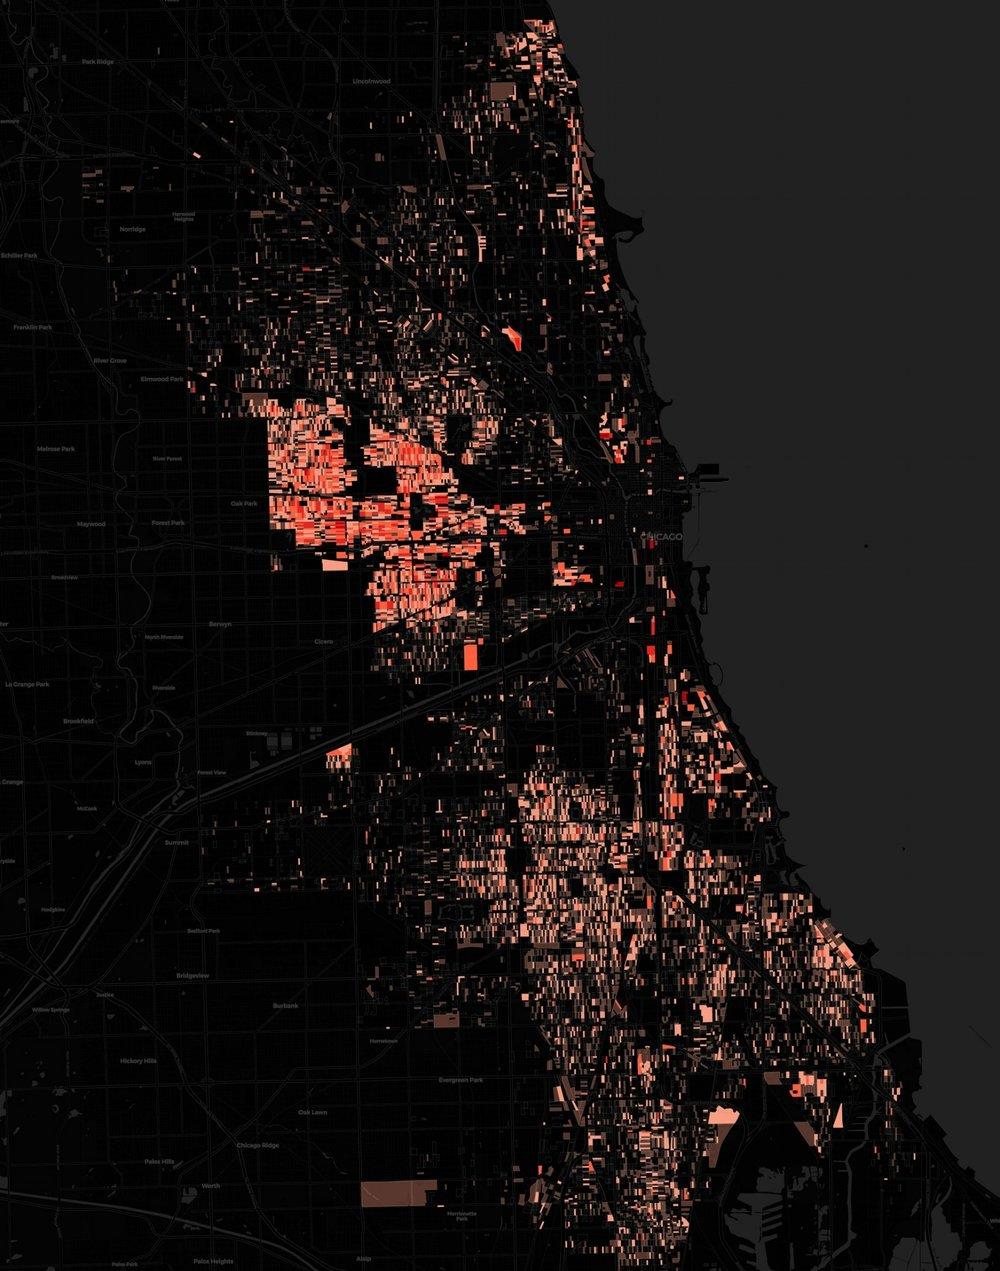 chicagos-million-dollar-blocks.jpg